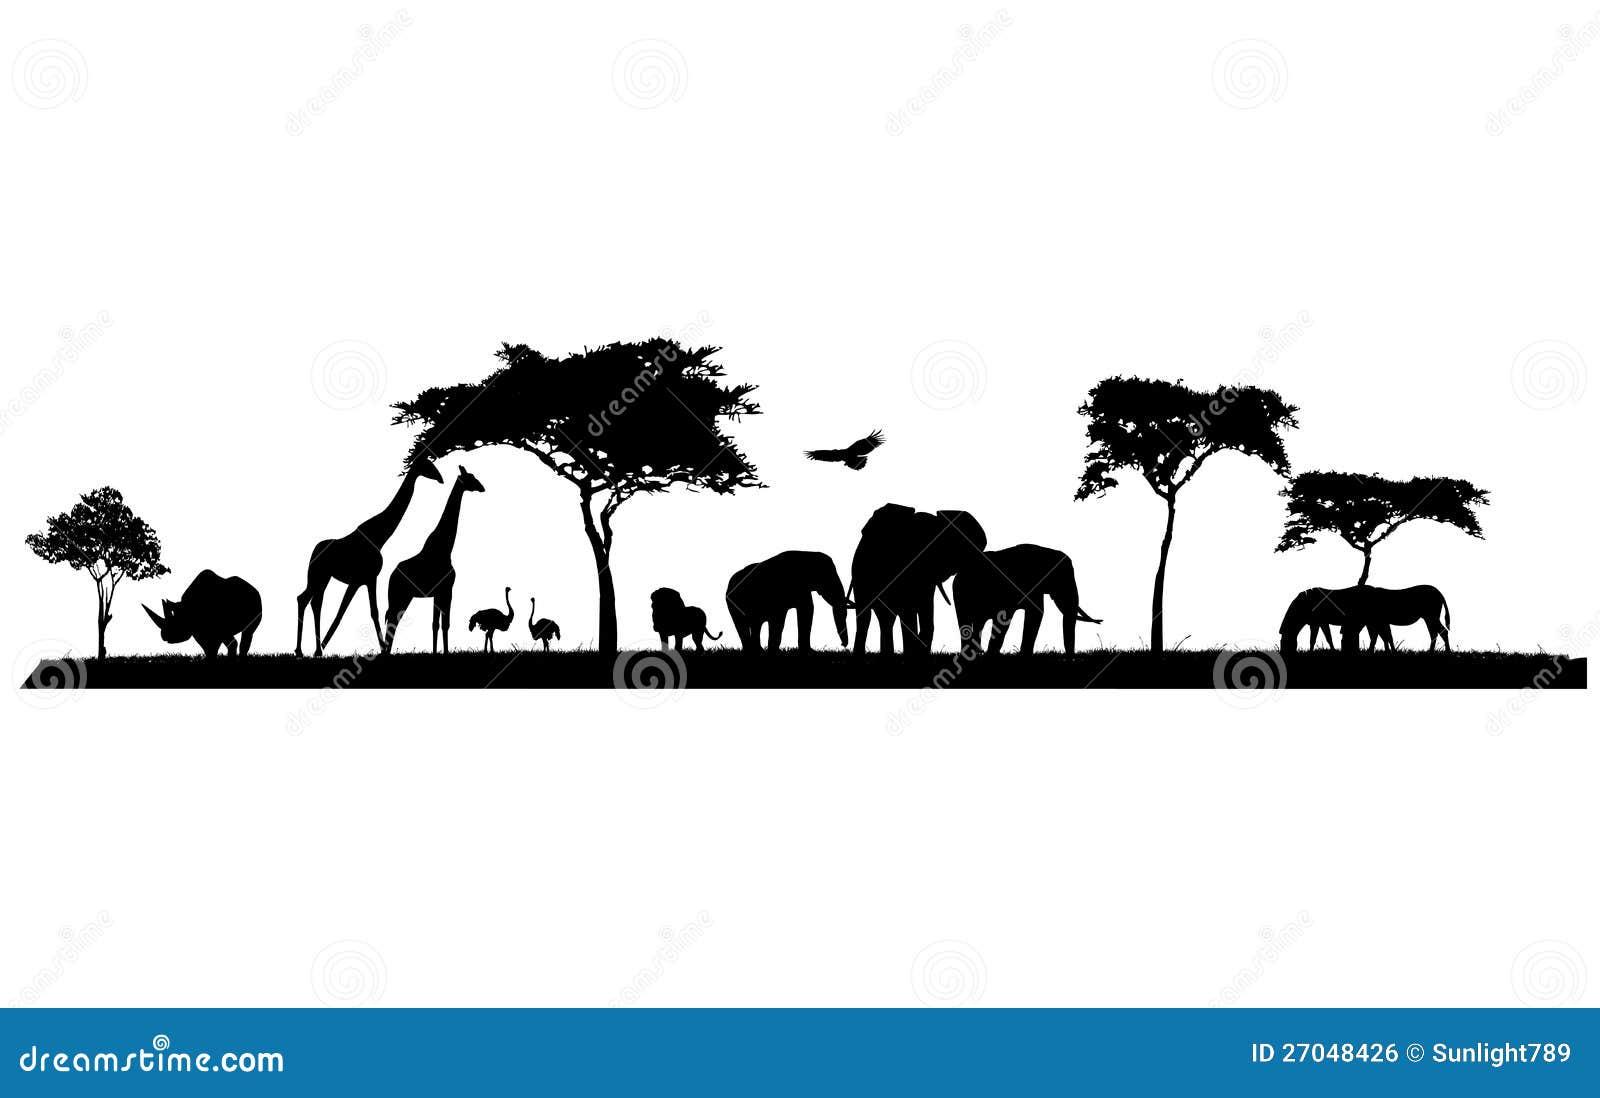 Sylwetka przyroda safari